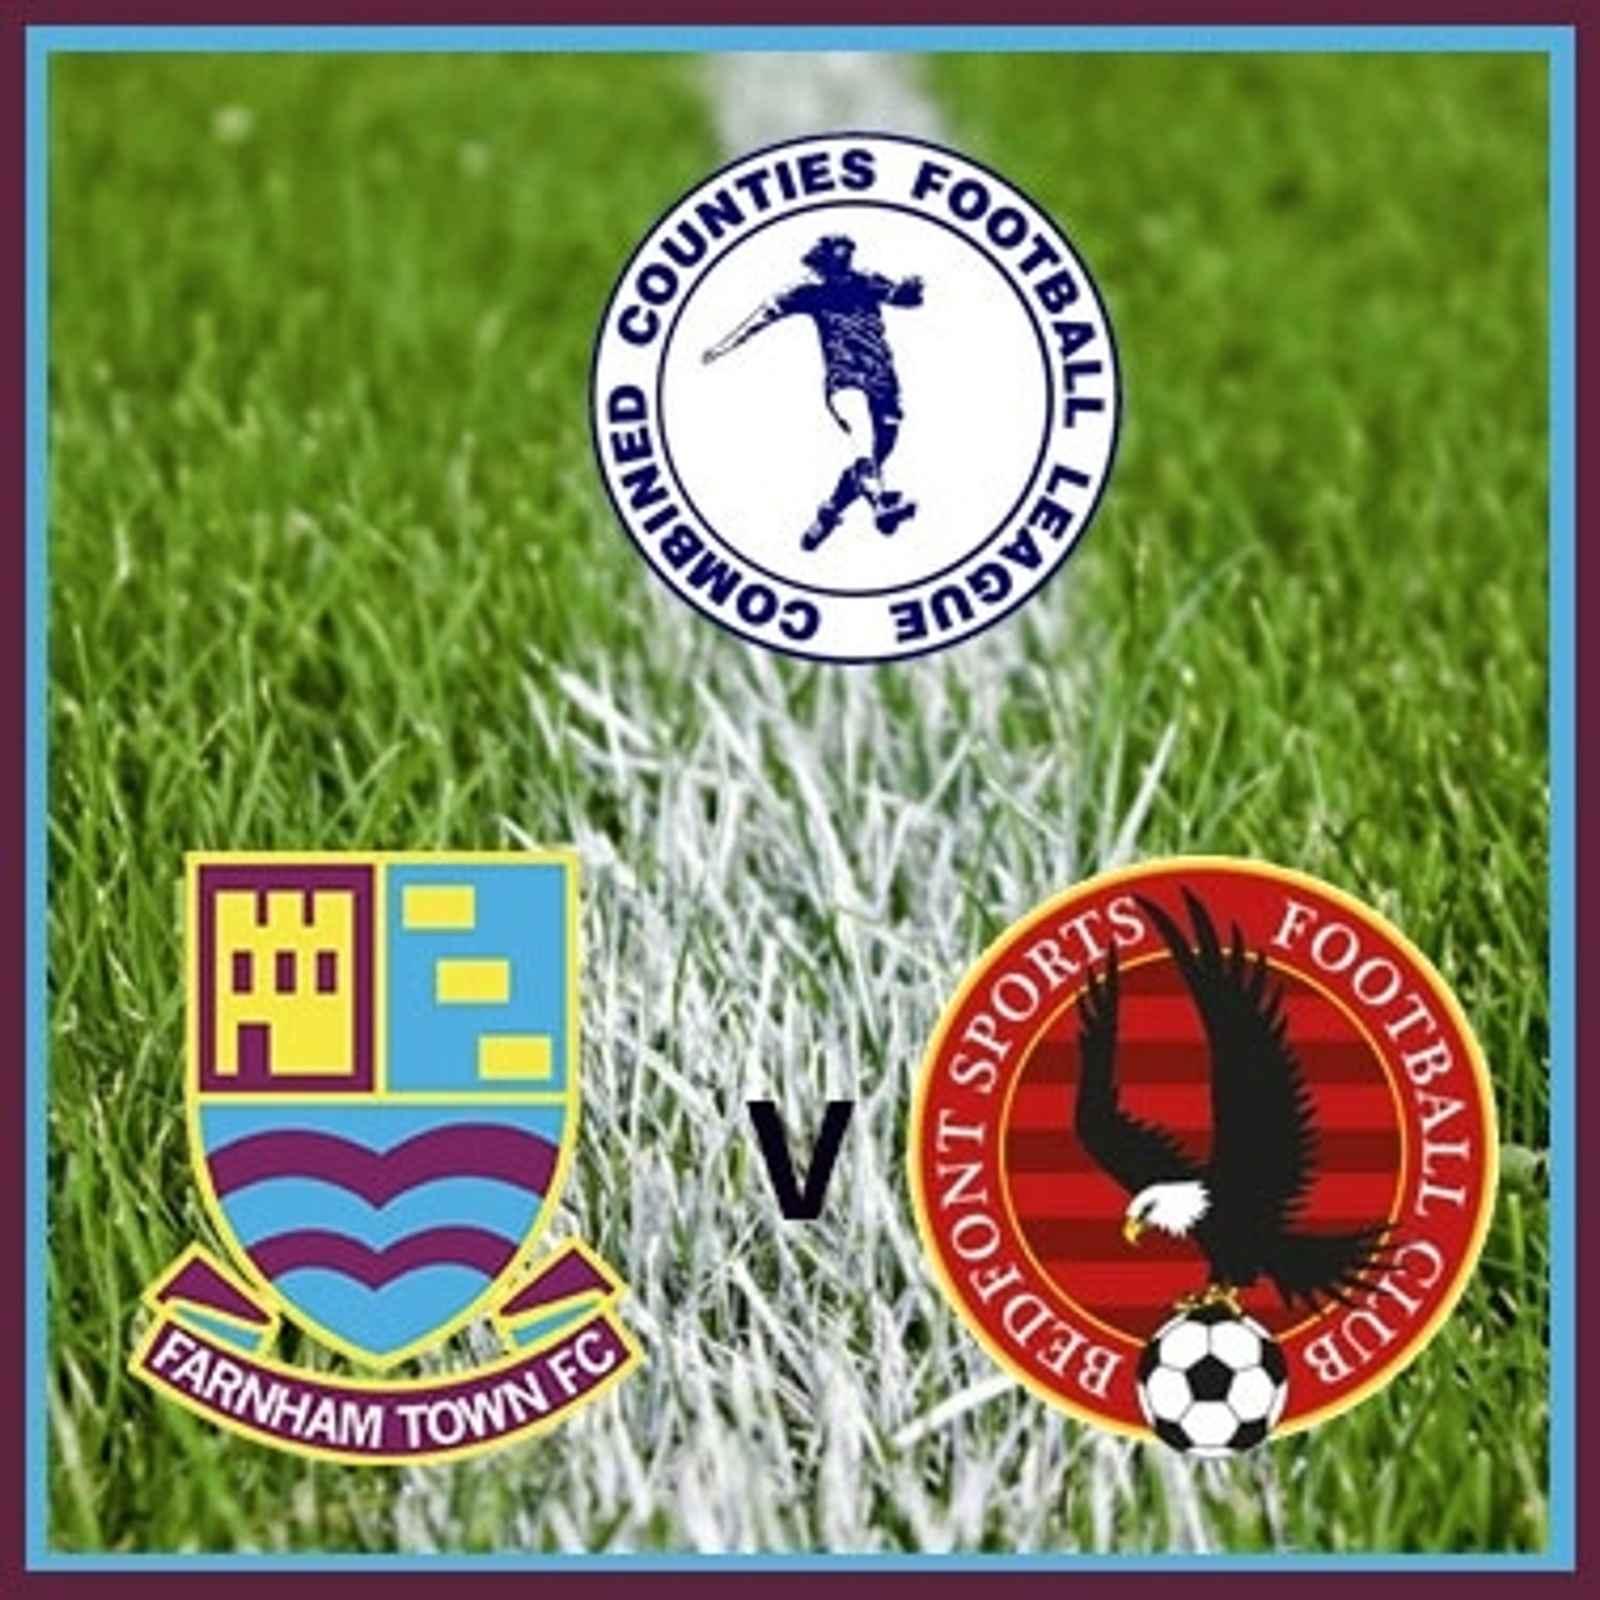 Match Preview: Farnham Town v Bedfont Sports